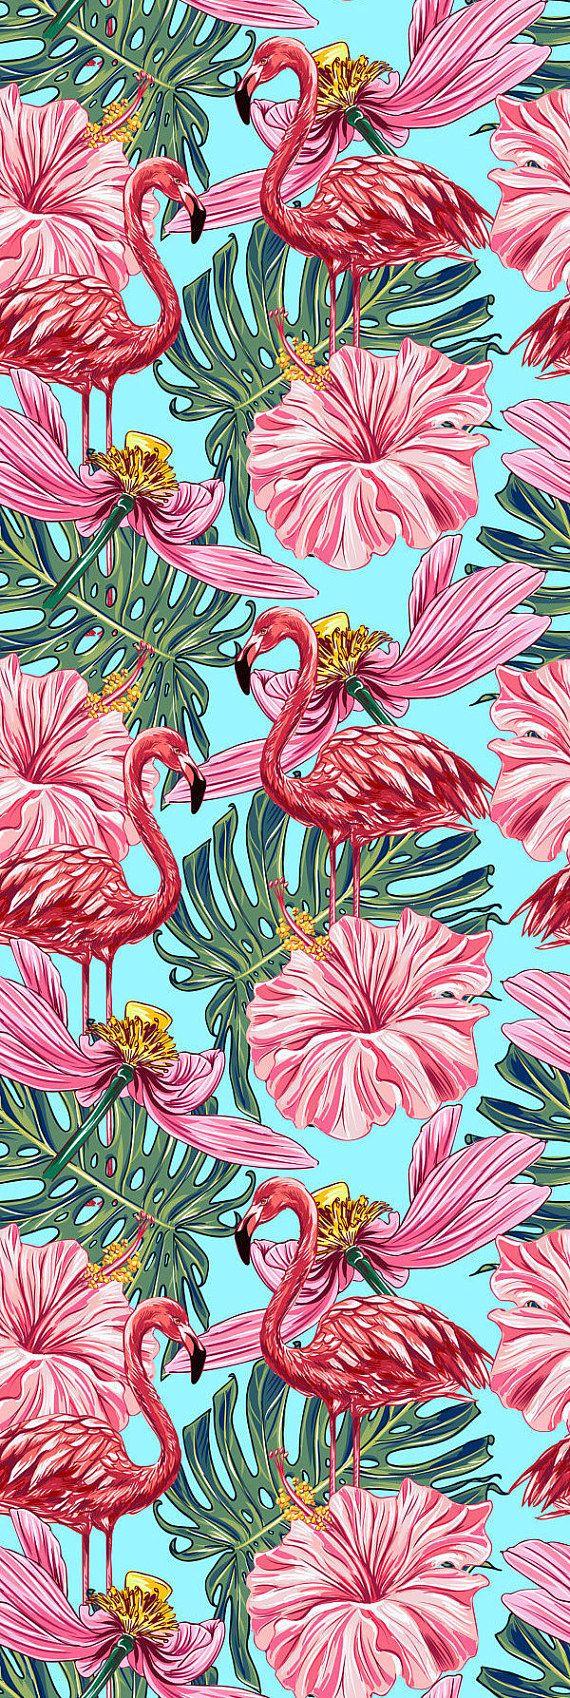 Removable Wallpaper Self Adhesive Wallpaper Pink Flamingos Etsy Wallpaper Tropical Flowers Tropical Prints Pattern